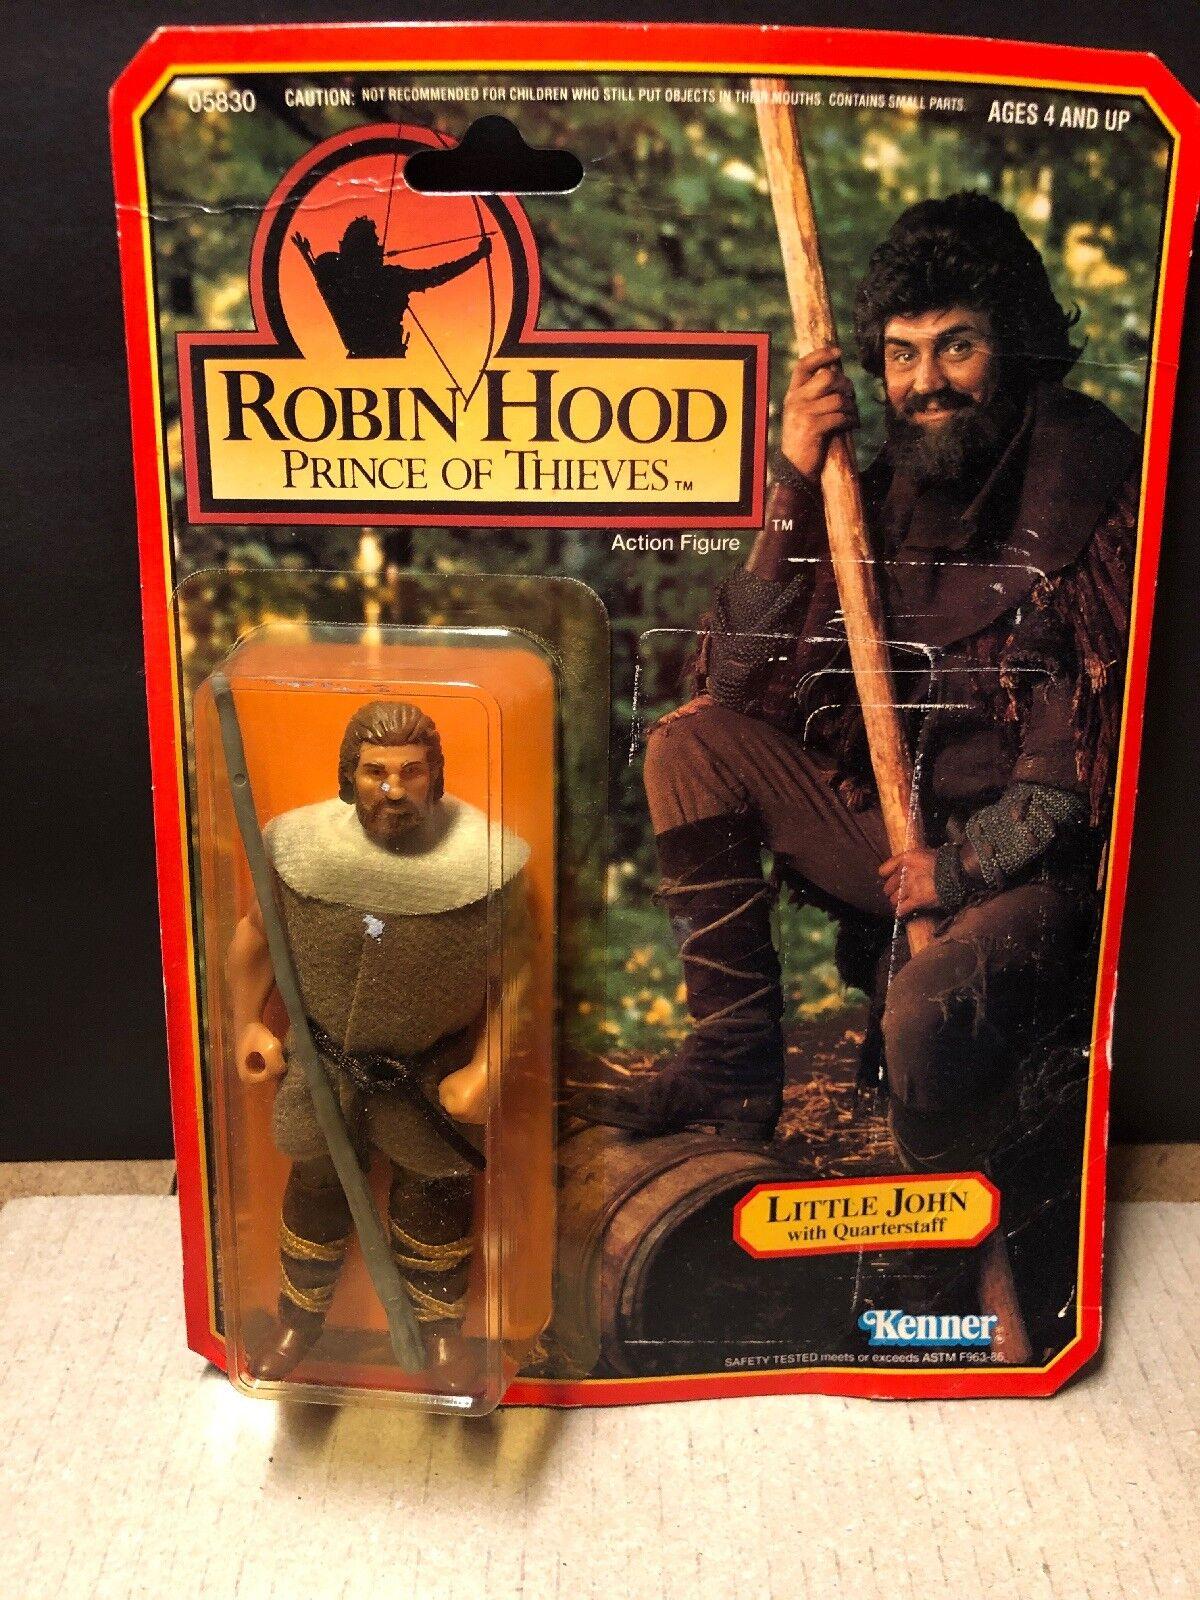 Little John Quarterstaff Robin Hood Prince of Thieves Action Figure Kenner 1991